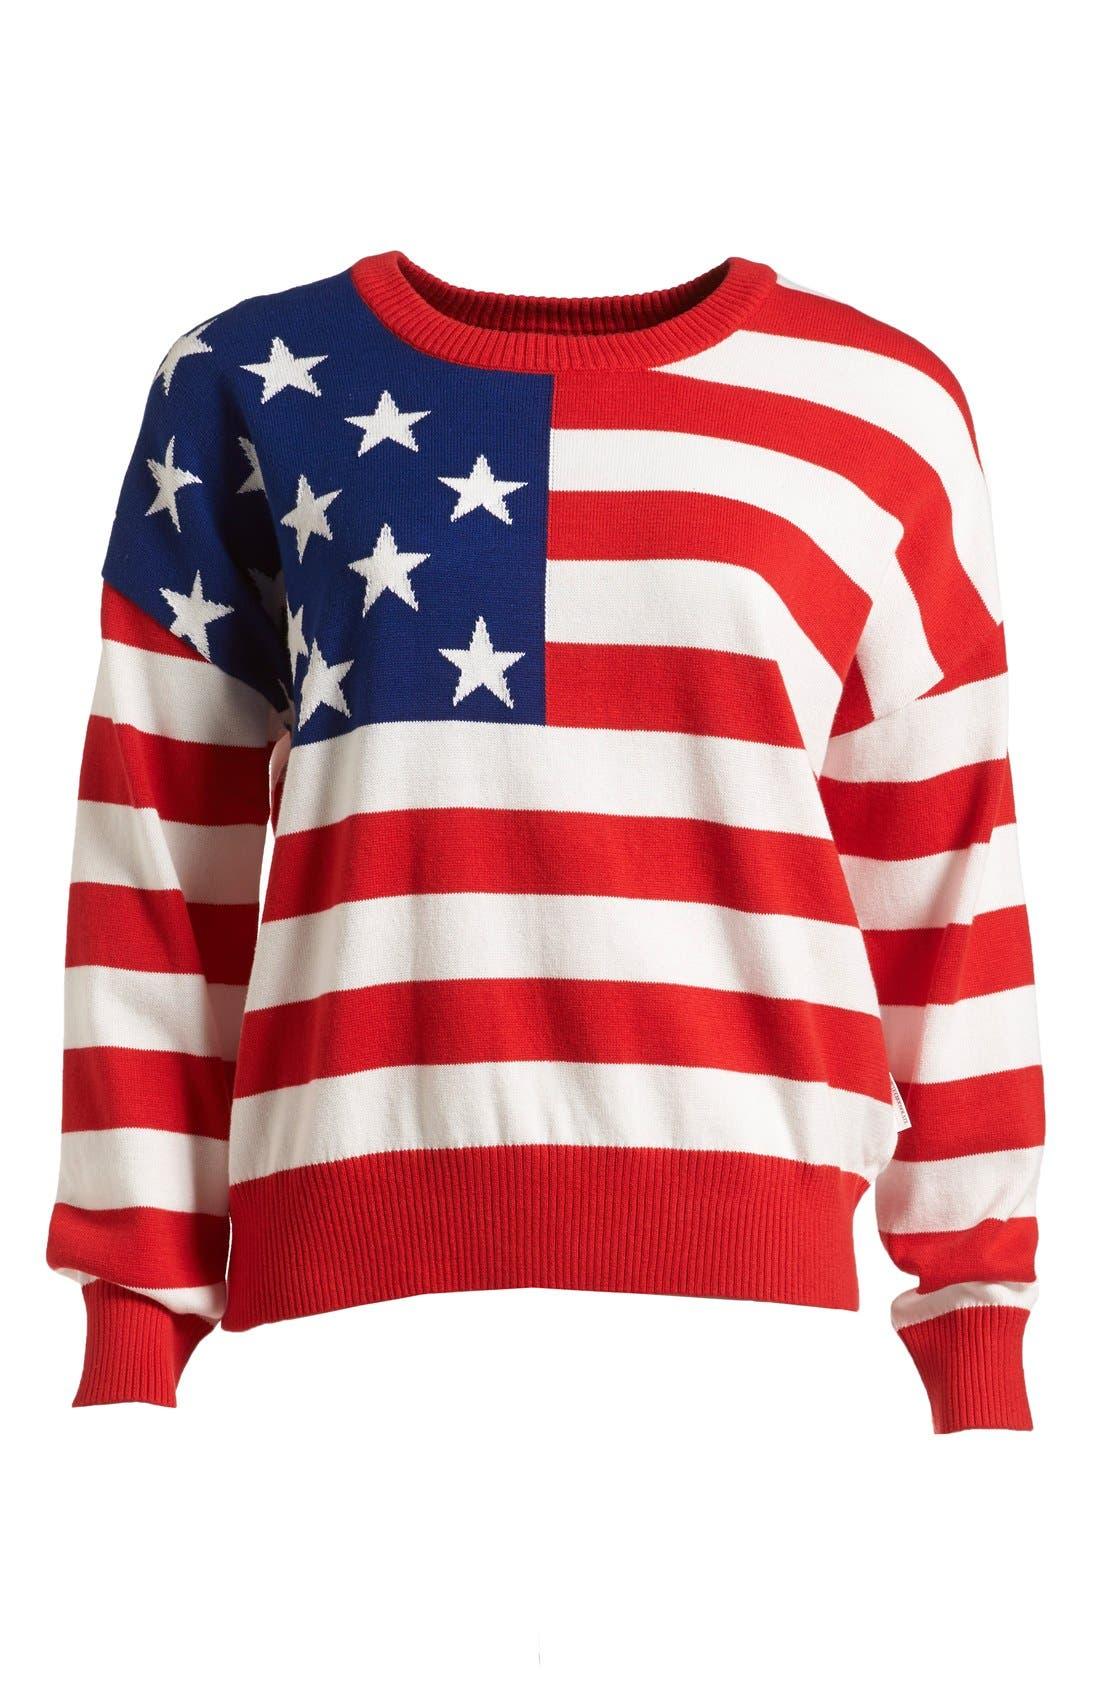 Main Image - :CHOCOOLATE US Flag Knit Sweater (Women)